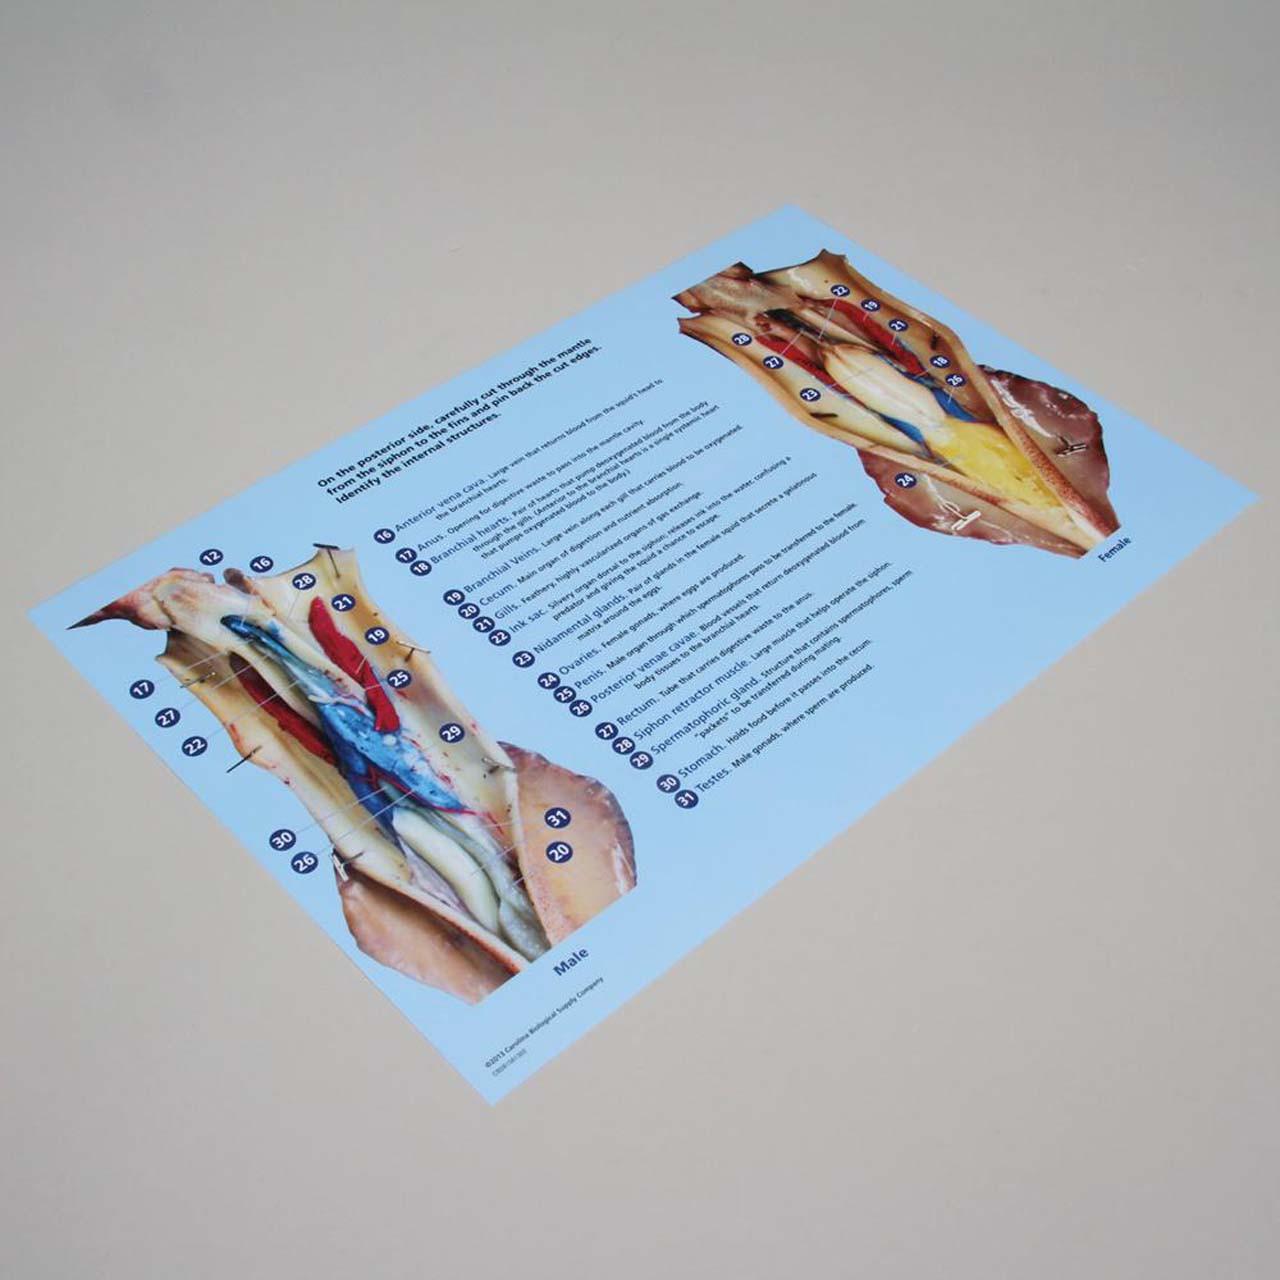 Squid dissection mat 28cm x 43cm